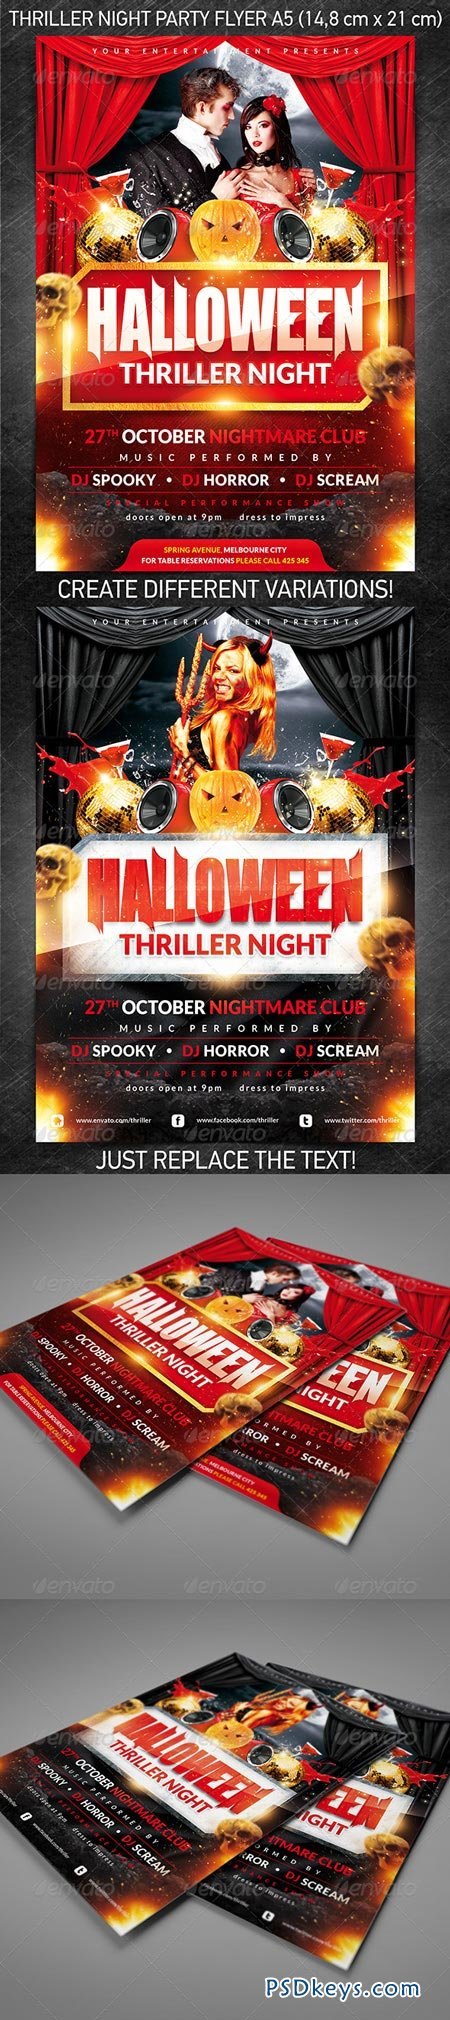 halloween thriller night party flyer 3160770 - Halloween Party Music Torrent